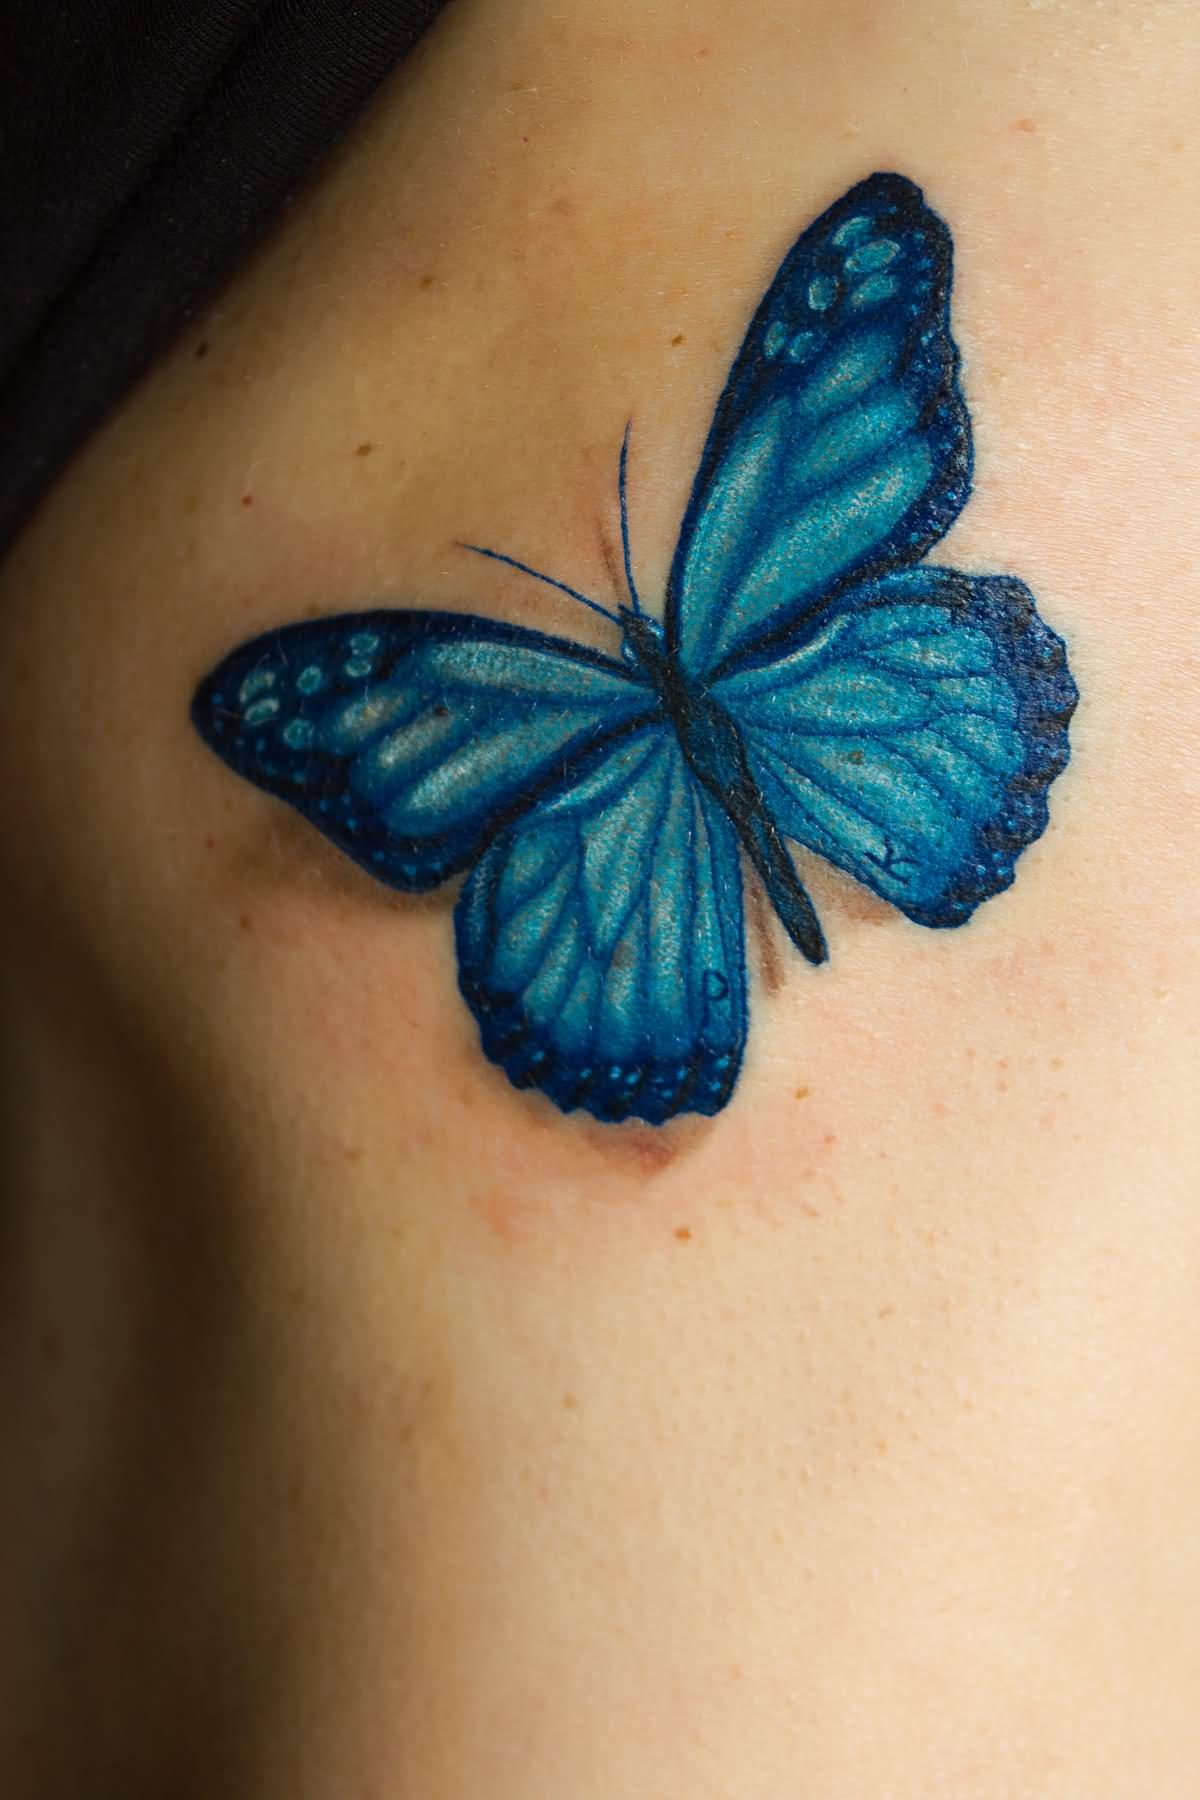 Blue morpho butterfly tattoo - photo#20